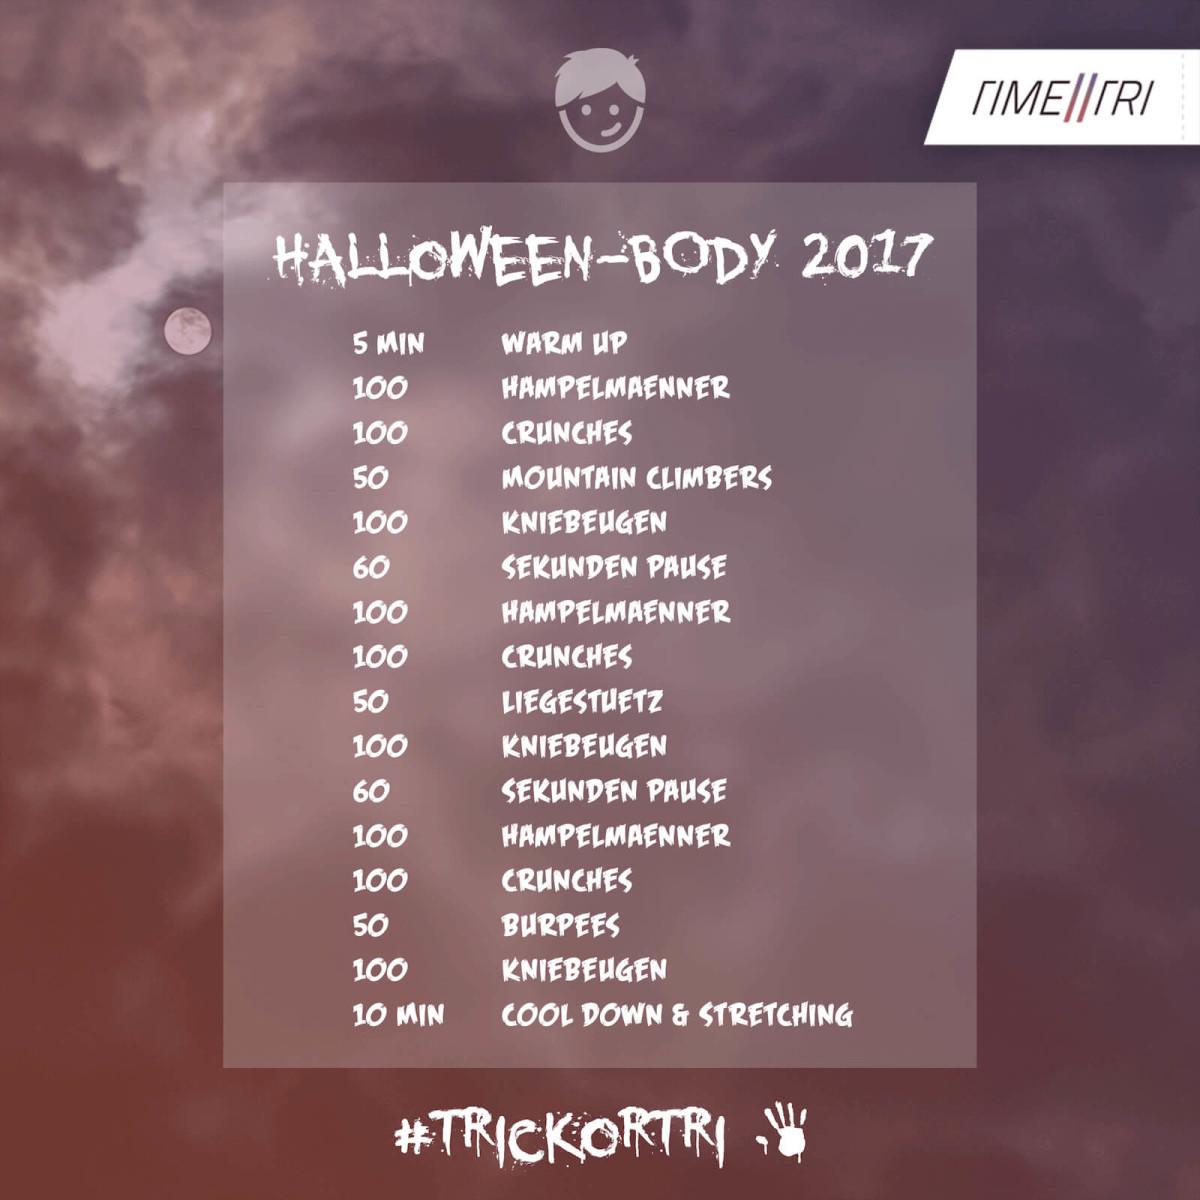 Halloween Body 2017